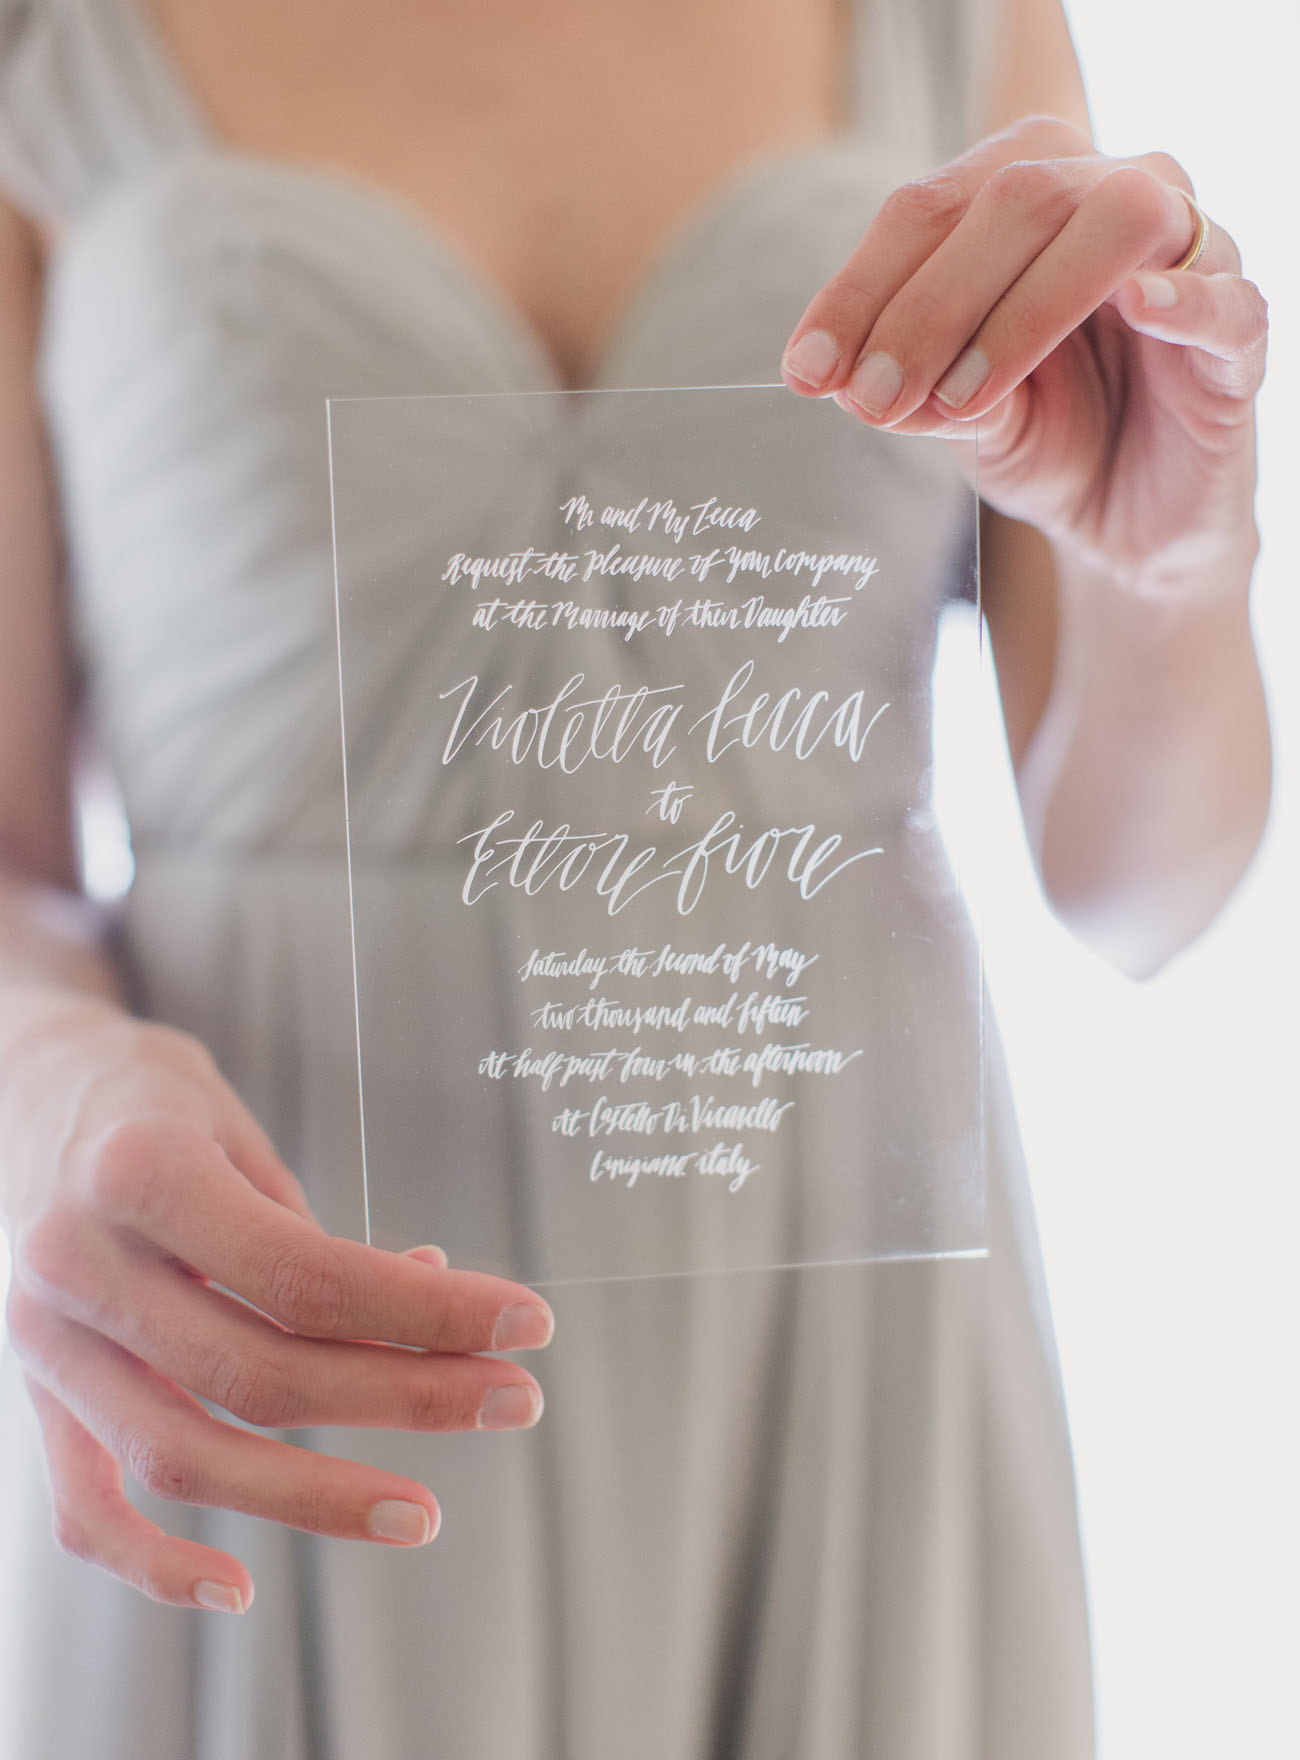 Wedding Invitations greenweddingshoes.com - mademoisellefiona.com